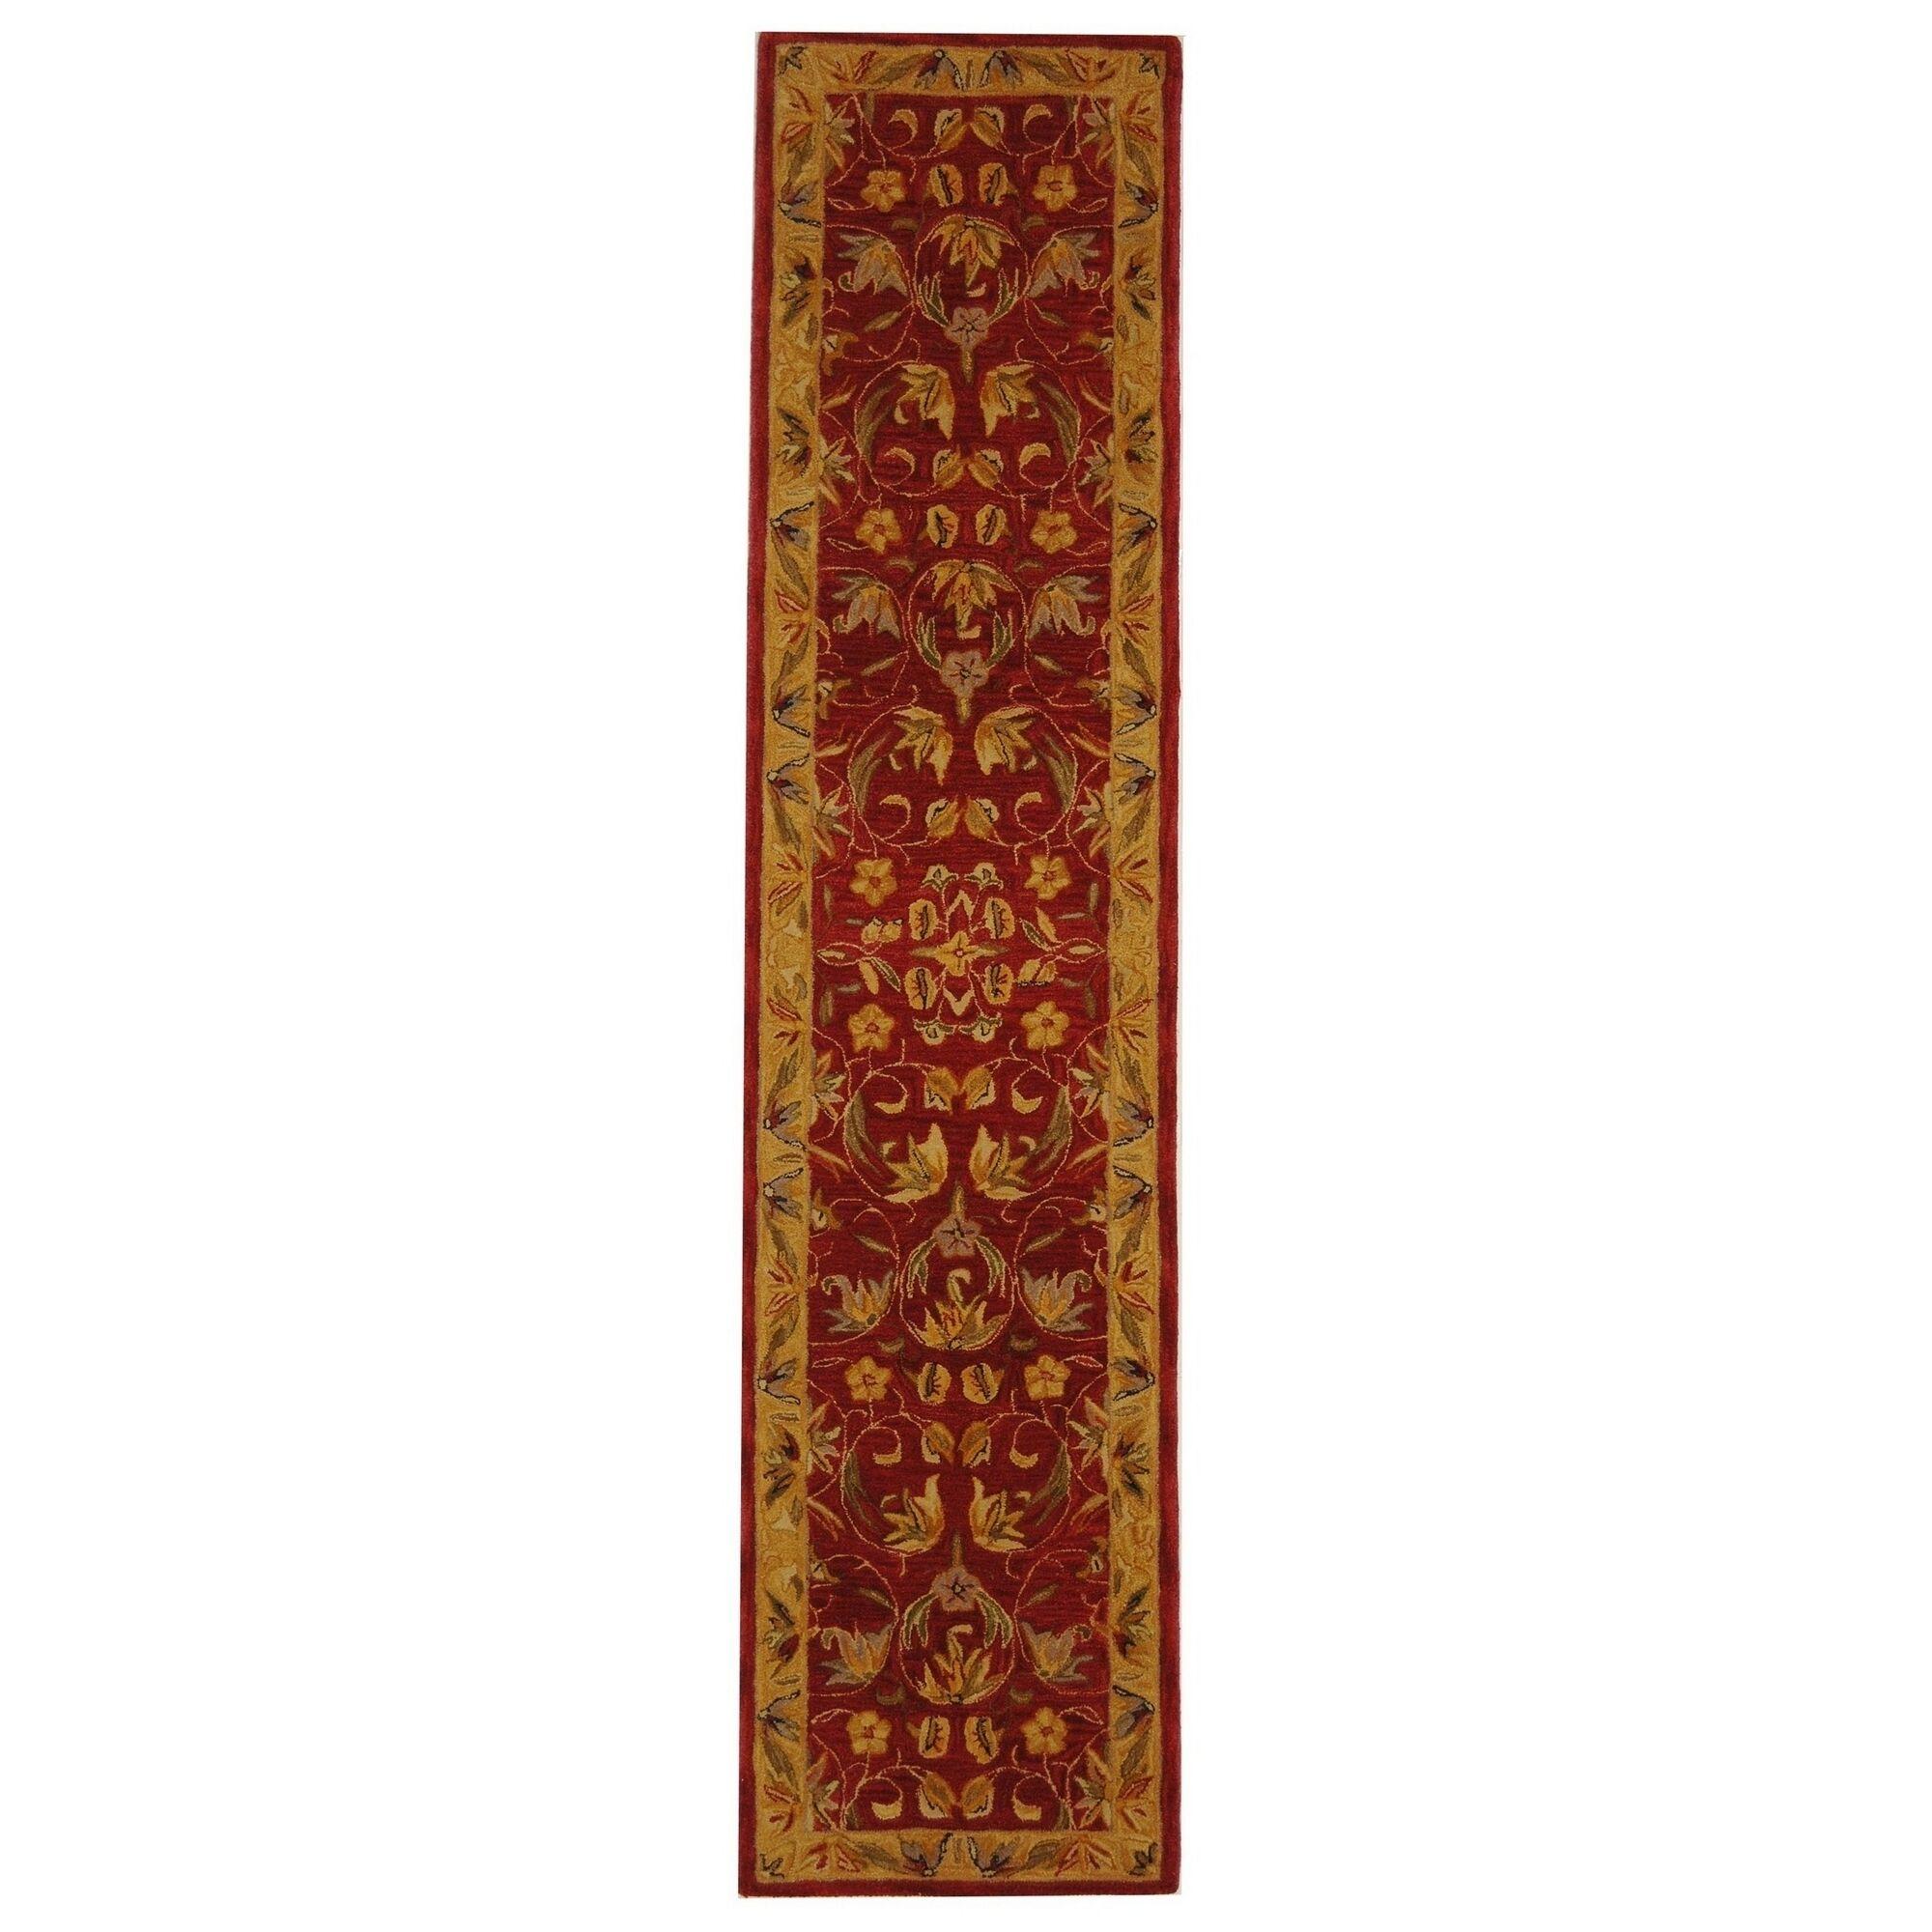 Anatolia Burgundy/Gold Area Rug Rug Size: Runner 2'3